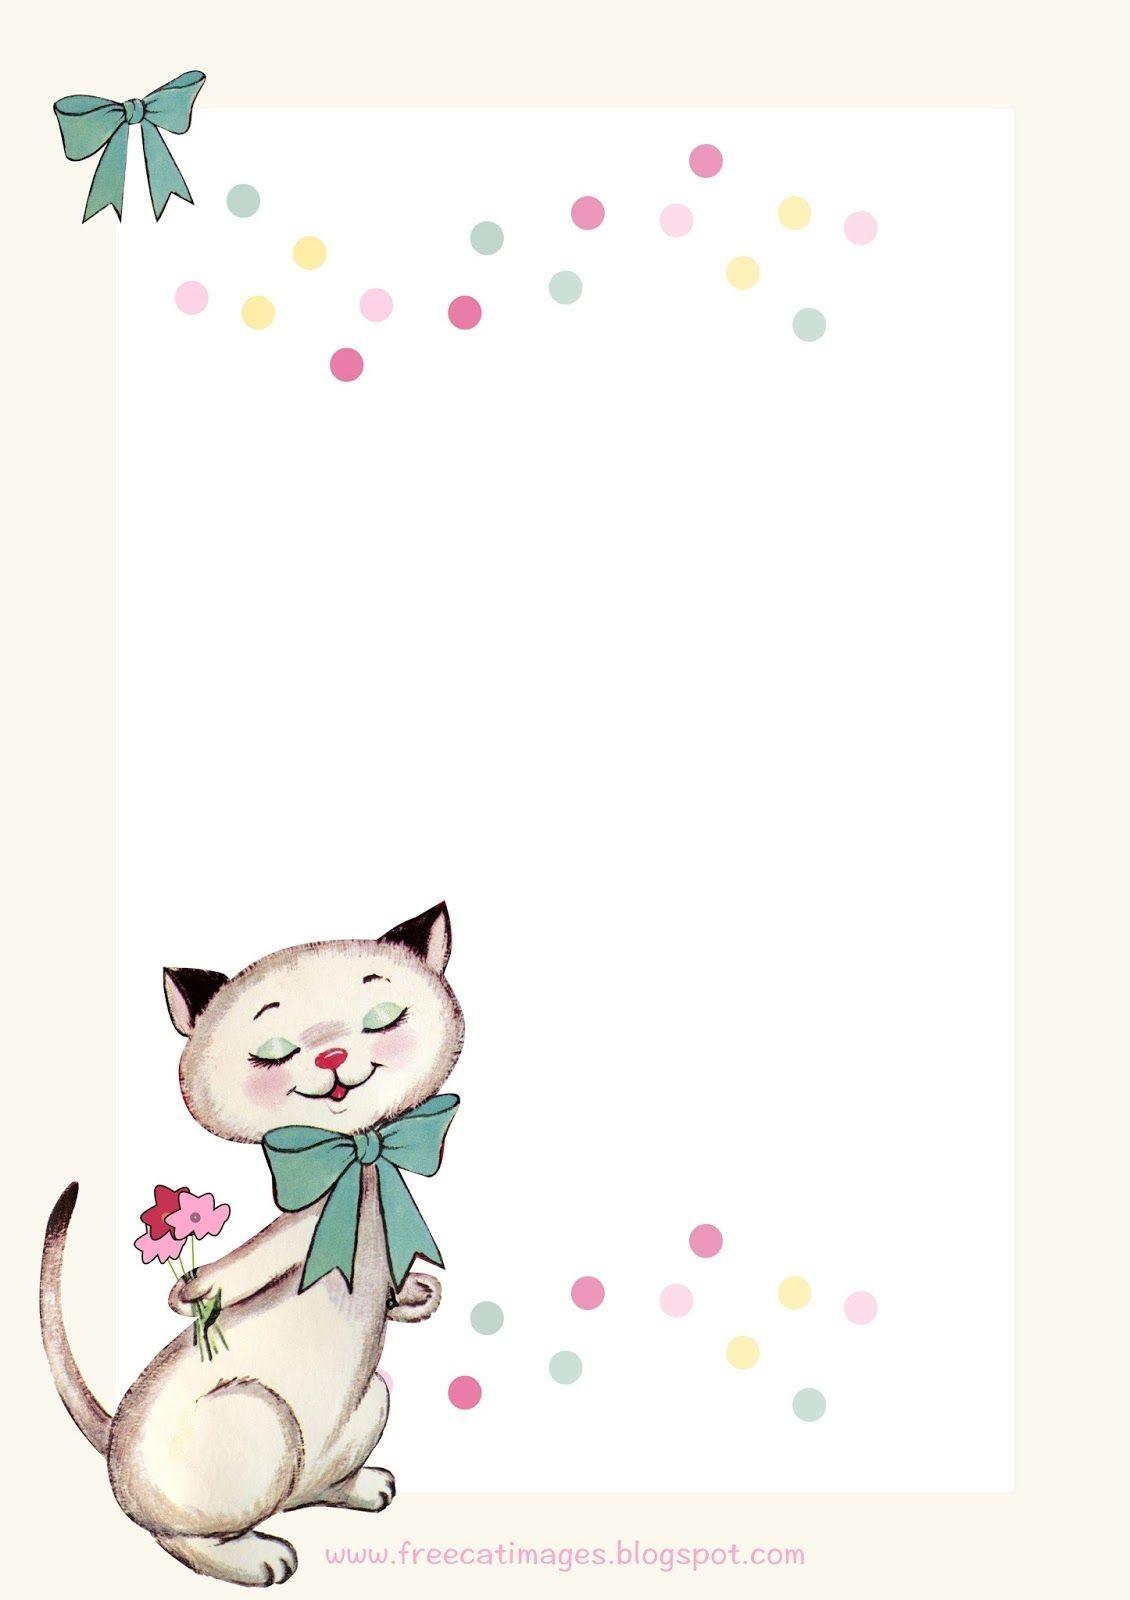 Free Cat Images: Free Printable Vintage Kitty Stationery - Freebie - Free Printable Kitten Birthday Invitations